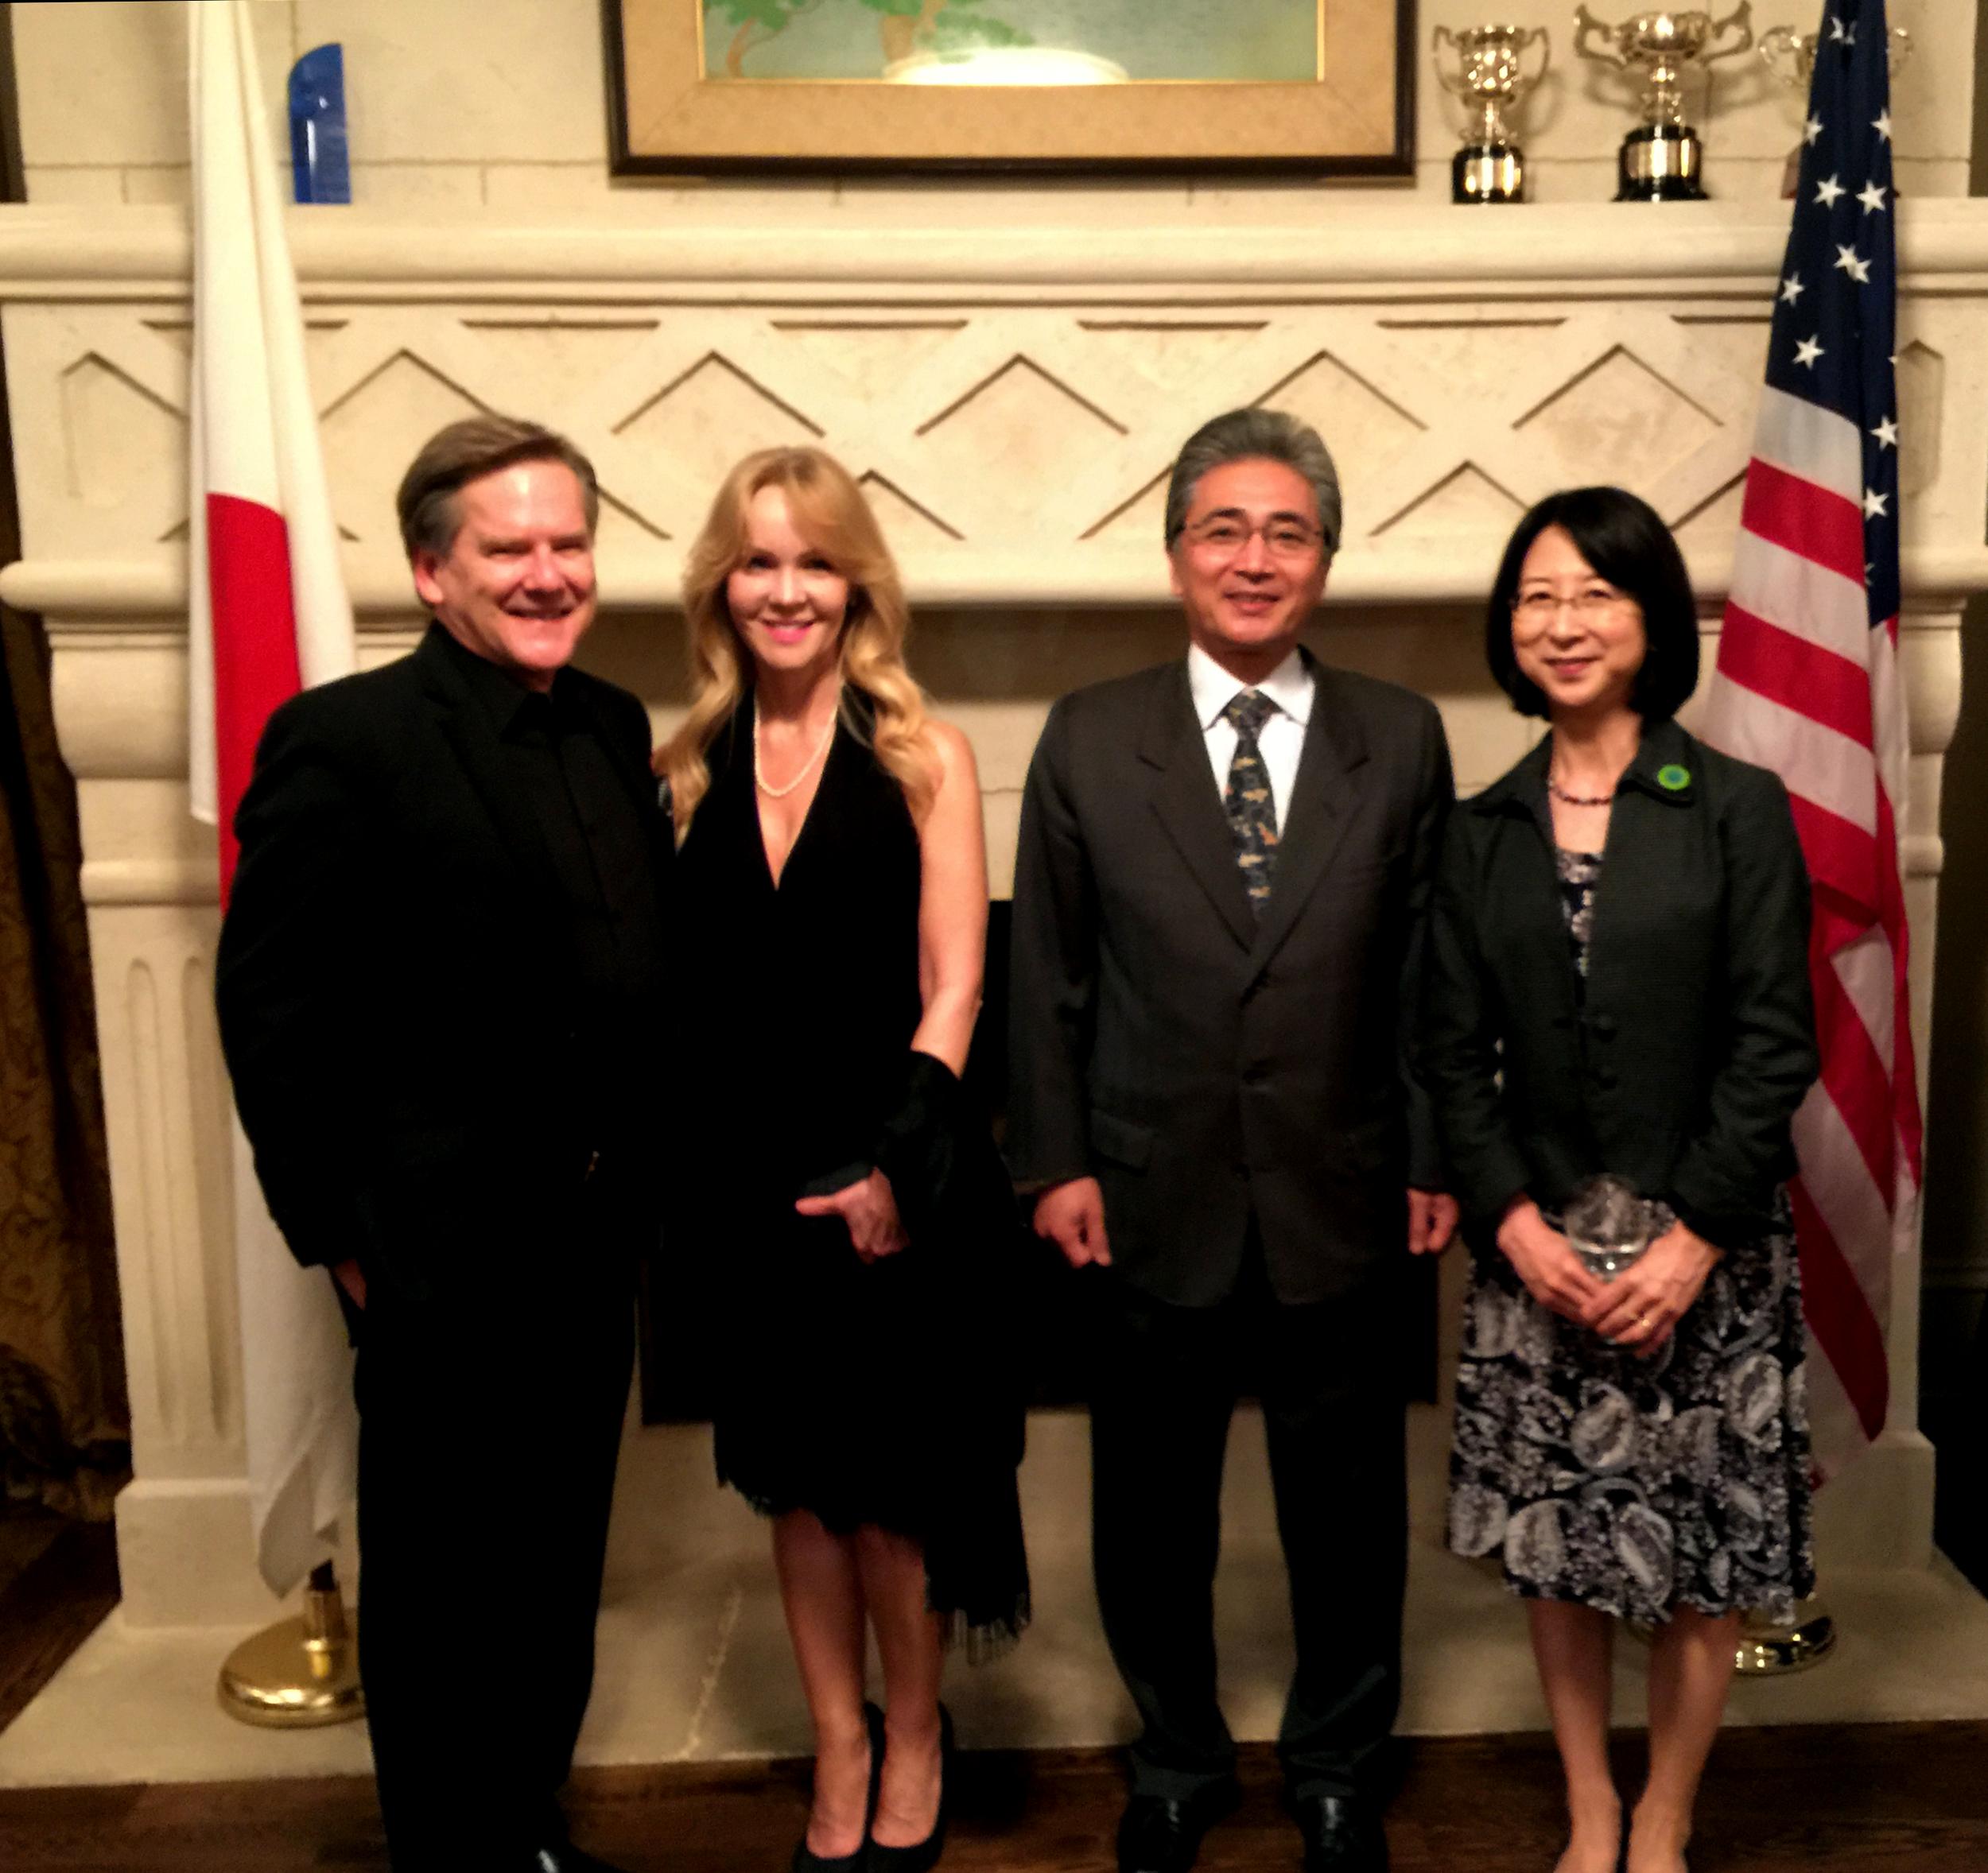 Kelly Frey, President of Movie City Films, Patti Titus, Consul-General of Japan Masami Kinefuchi and Mrs. Kinefuchi